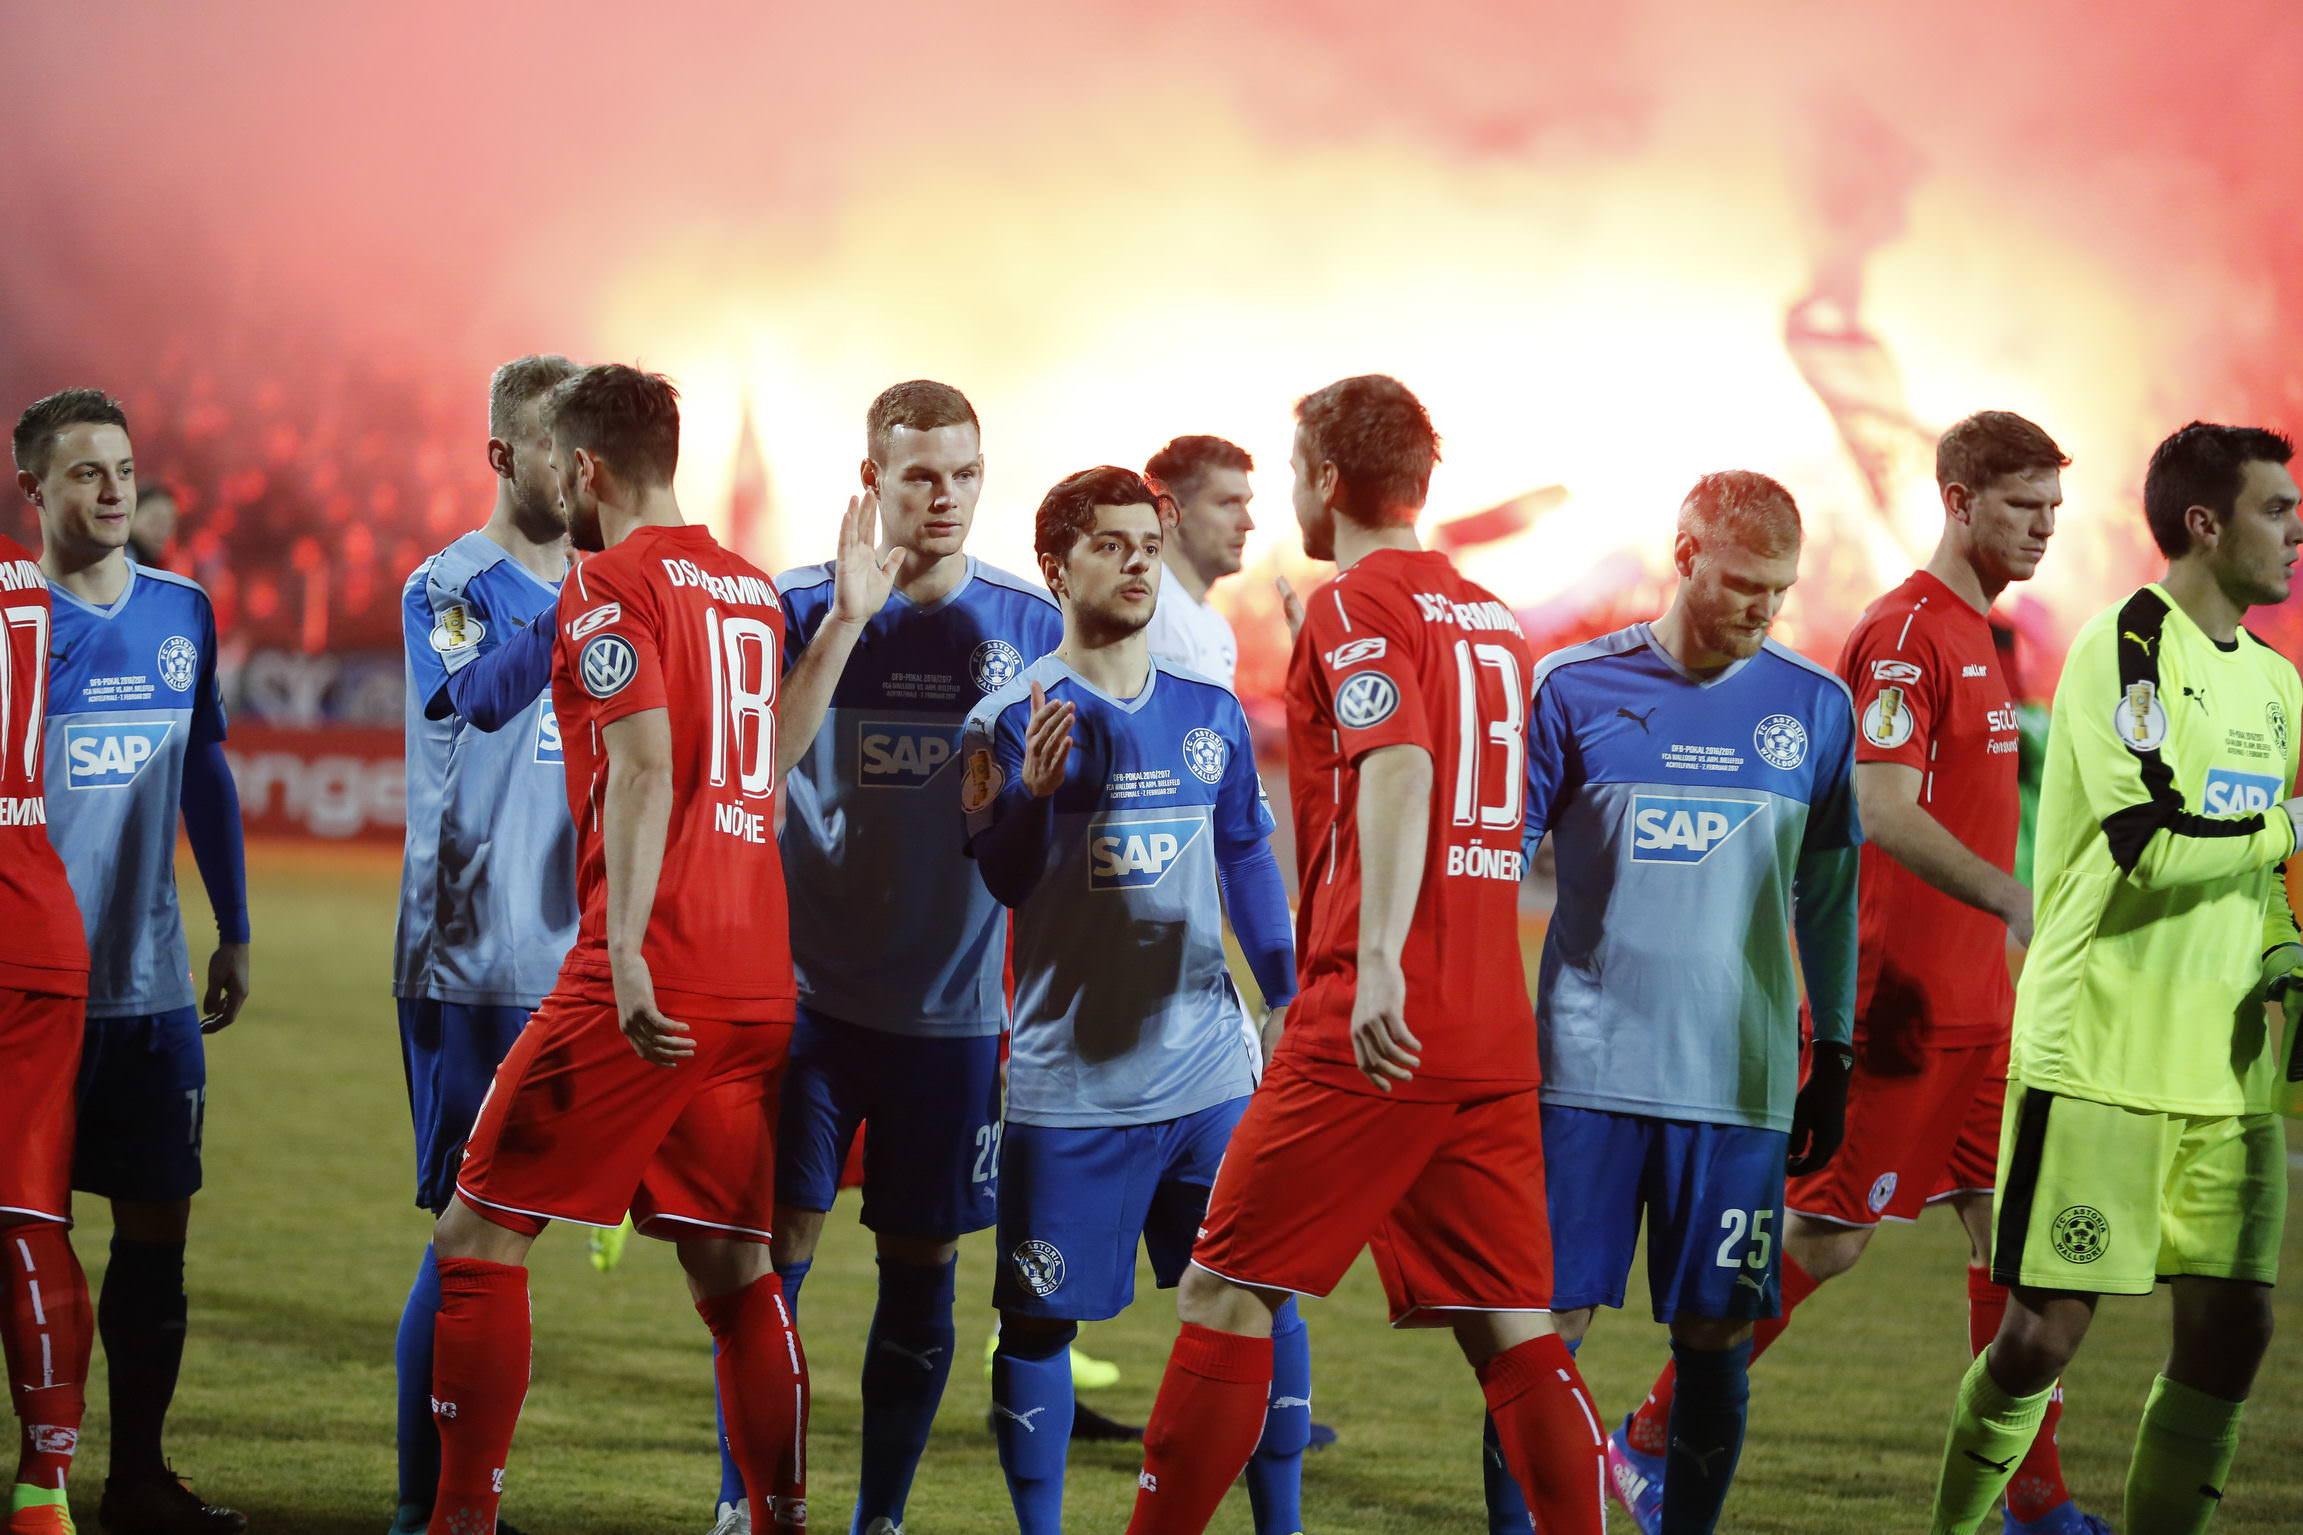 Fussball. DFB-Pokal, 2016-2017, 3. Runde. FC Astoria Walldorf - Arminia Bielefeld. 07.02.2017 -